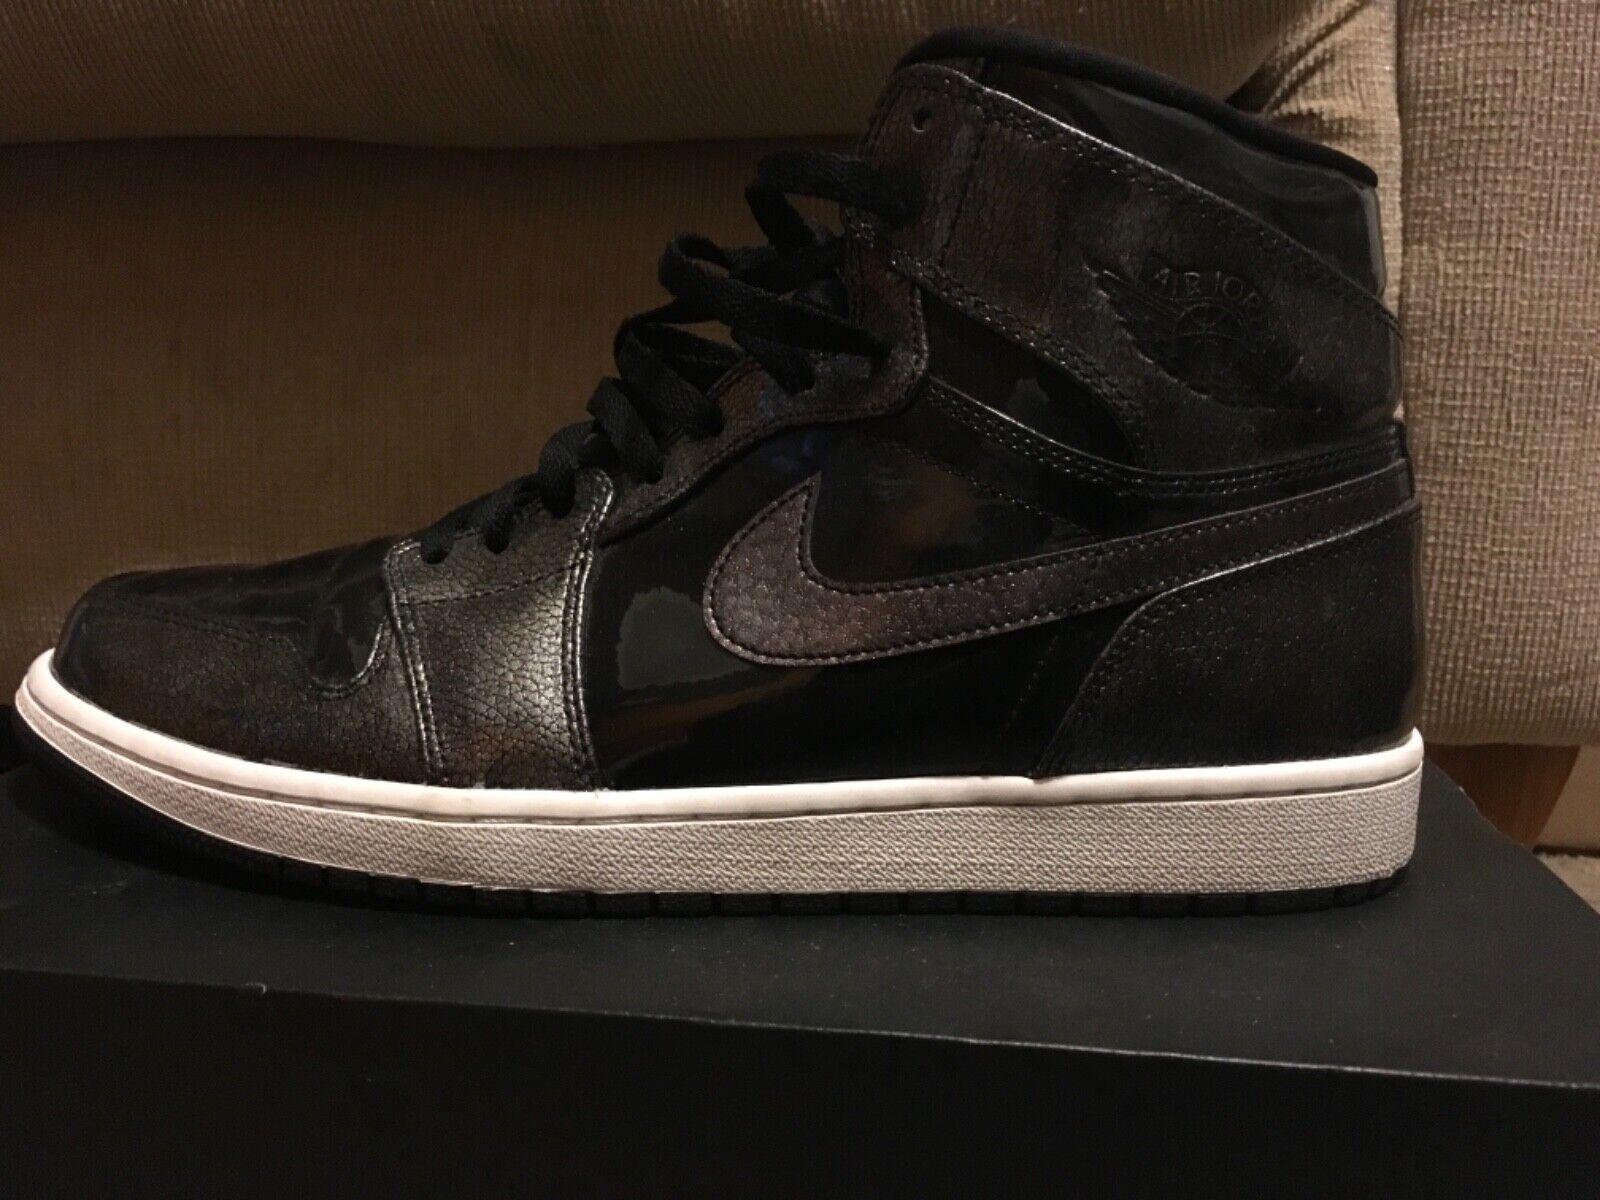 Nike Air Jordan 1 Retro High Black Anthracite 332550-017 Sz 13 Patent Leather